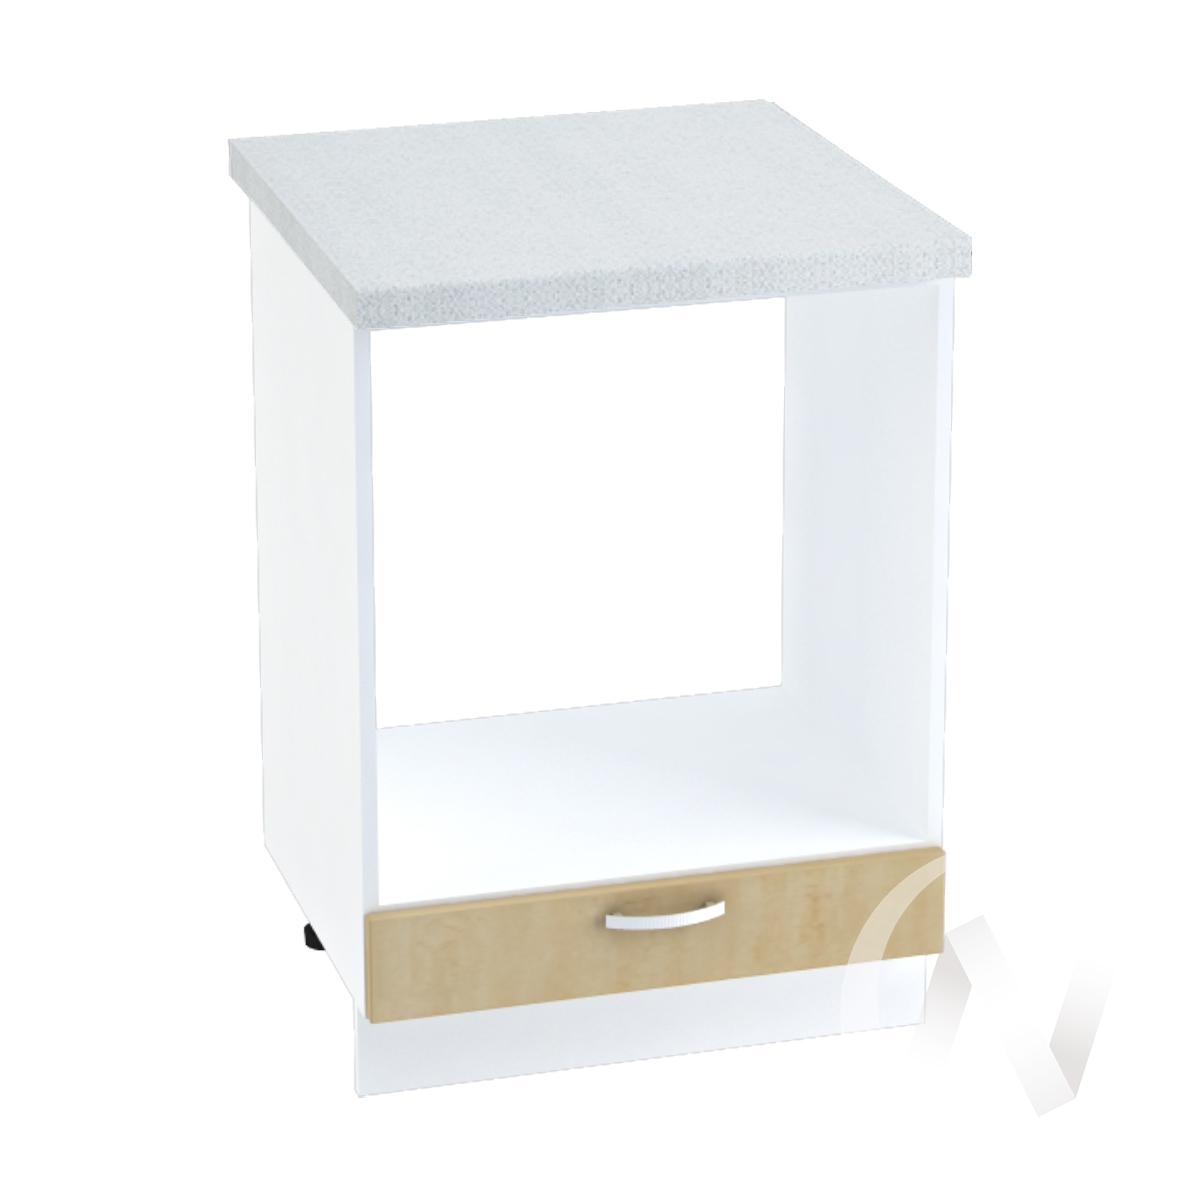 "Кухня ""Настя"": Шкаф нижний под духовку 600, ШНД 600 (Береза/корпус белый)"